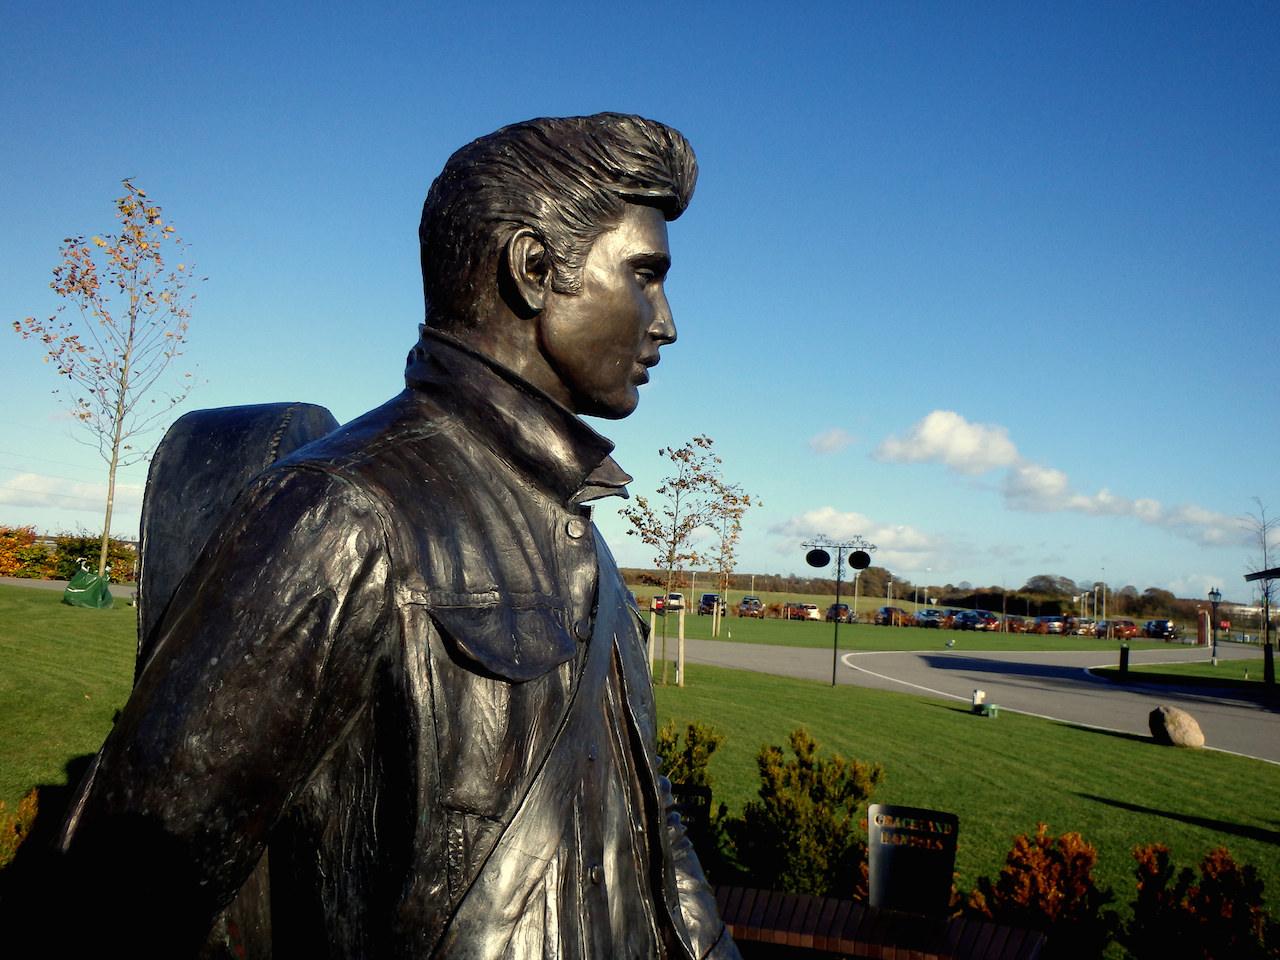 "A statue of Elvis Presley outside Memphis Mansion (formerly Graceland Randers) in Randers, Denmark (photo by <a href=""https://flic.kr/p/A5zecP"">Insights Unspoken/Flickr</a>)"